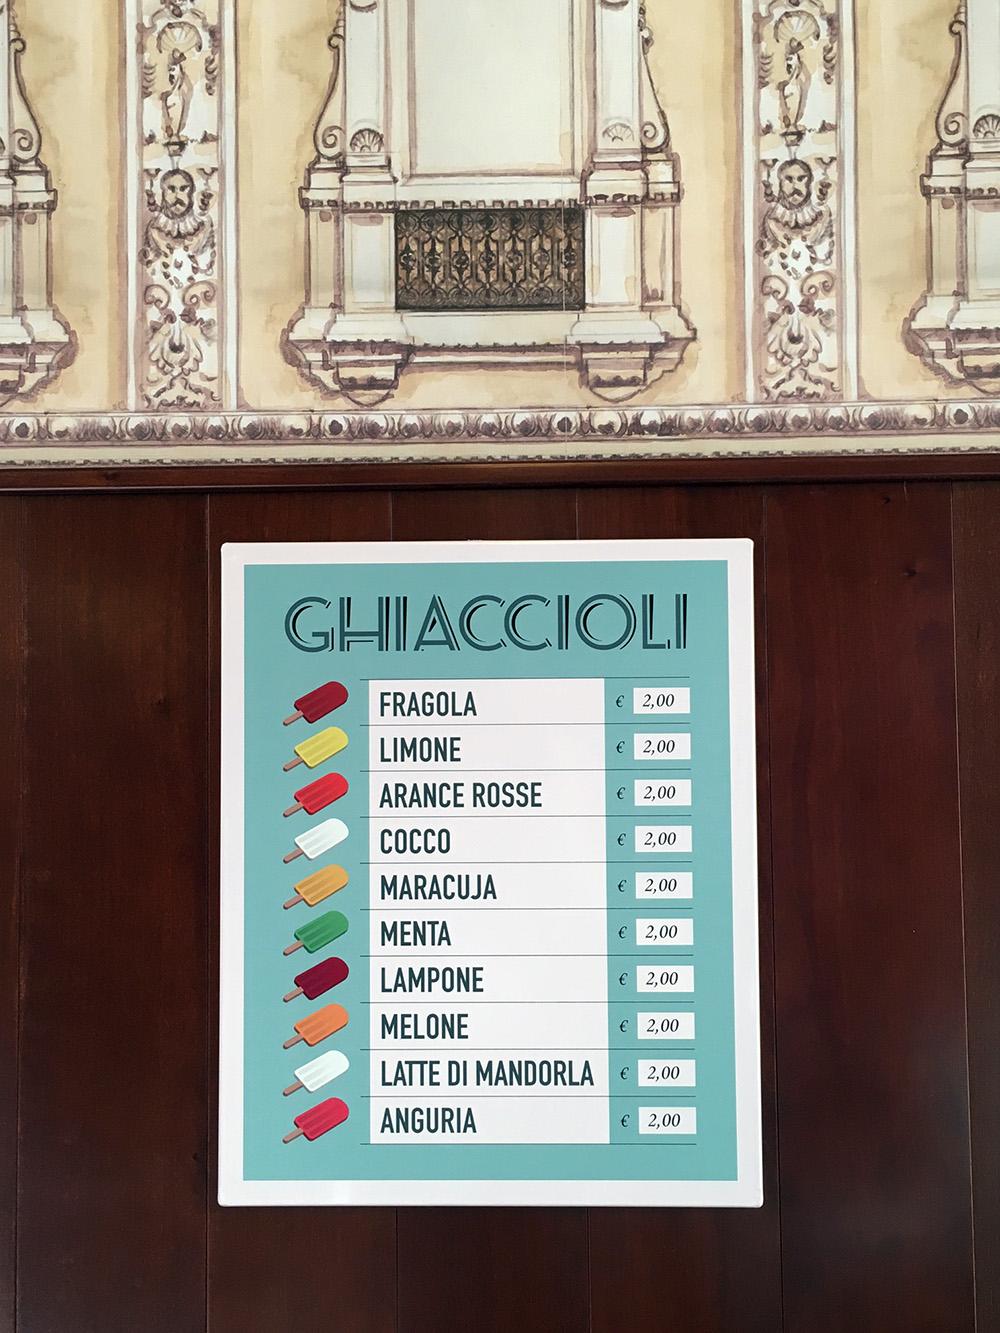 Wes-Anderson-Bar-Luce-Fondazione-Prada-Milano-03